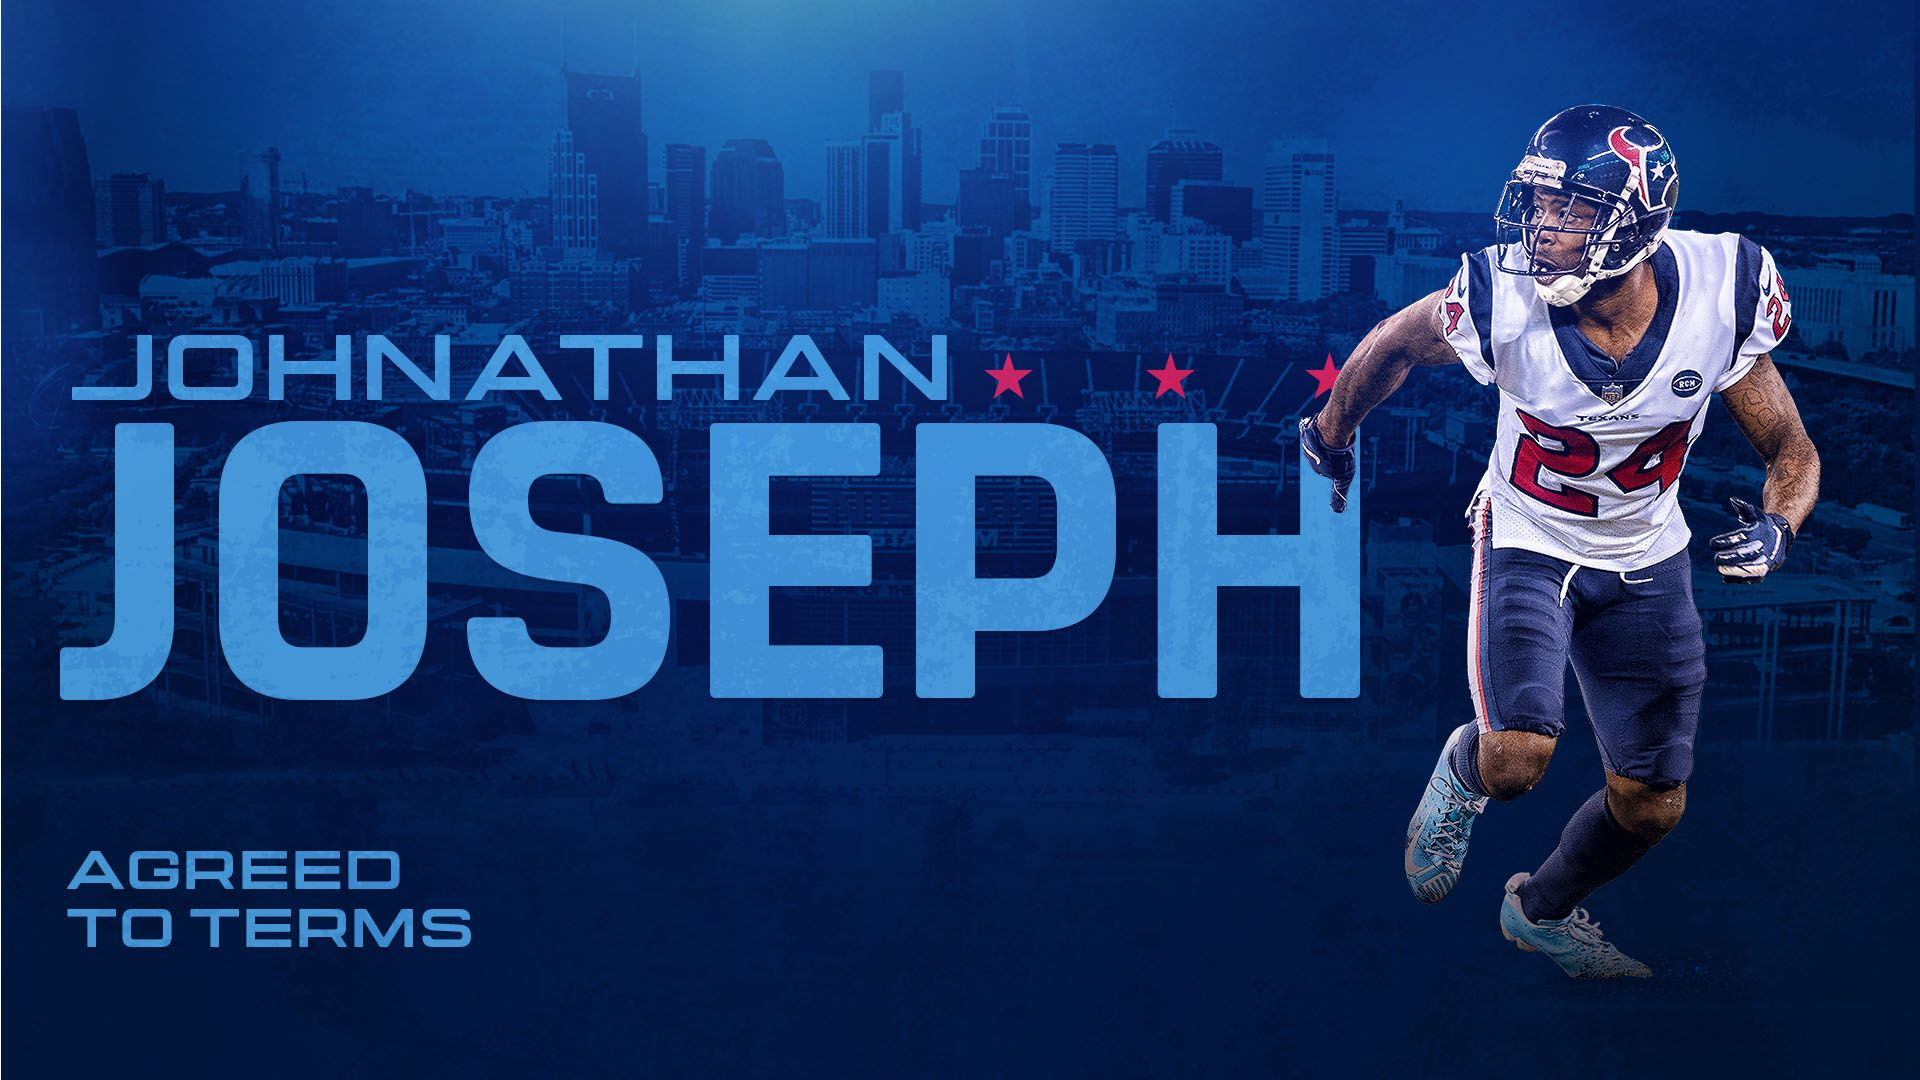 Johnathan Joseph